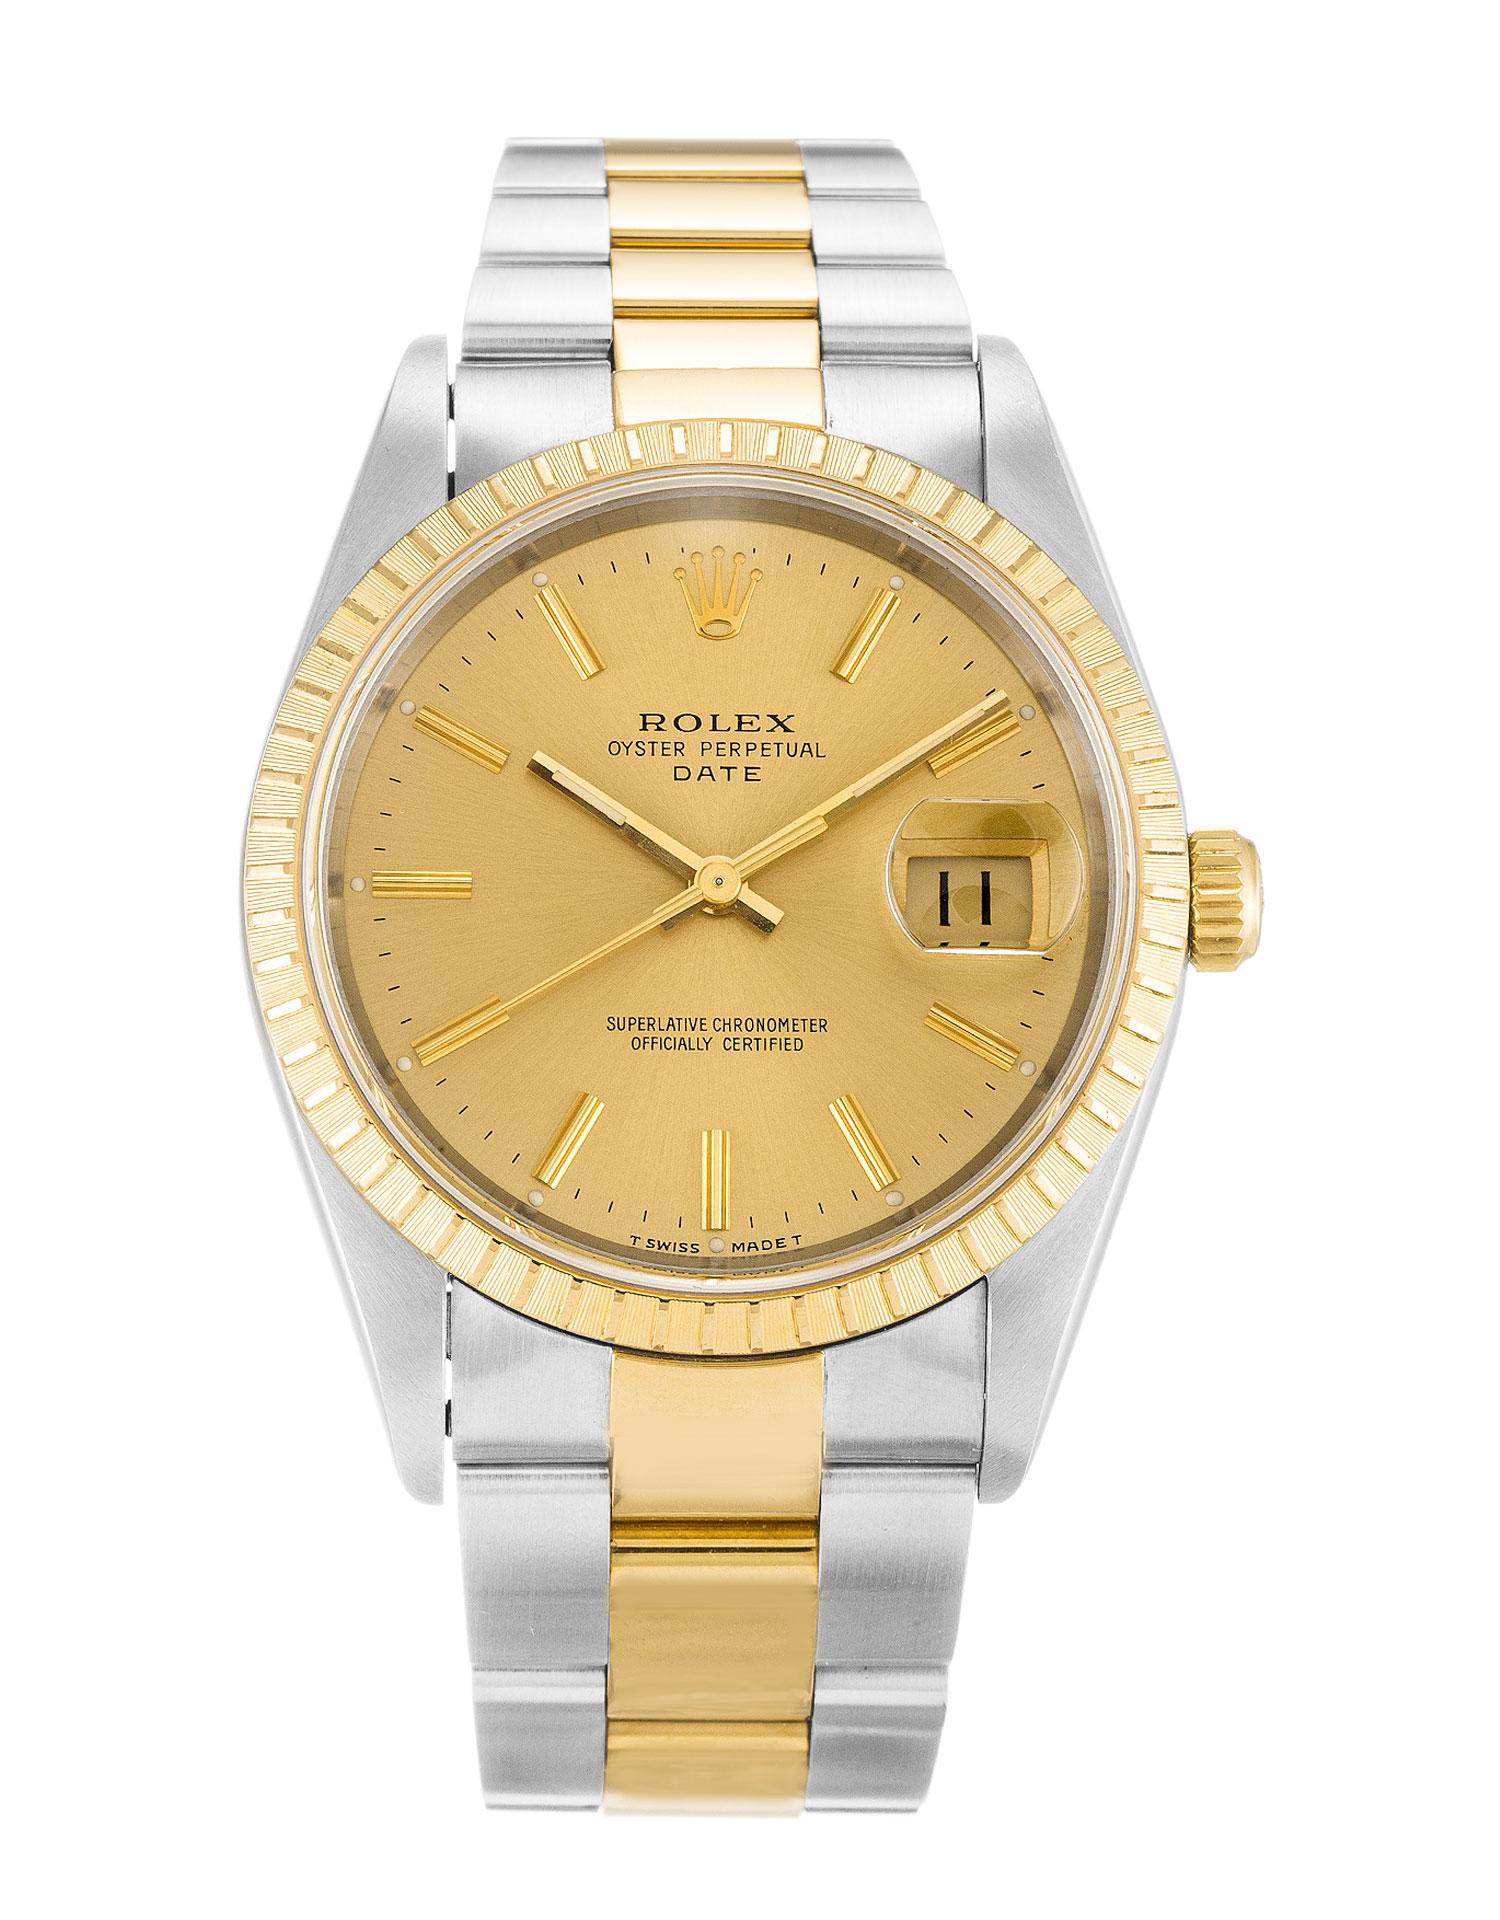 replica Rolex Oyster Perpetual Date 15223 34MM Champagne Dial